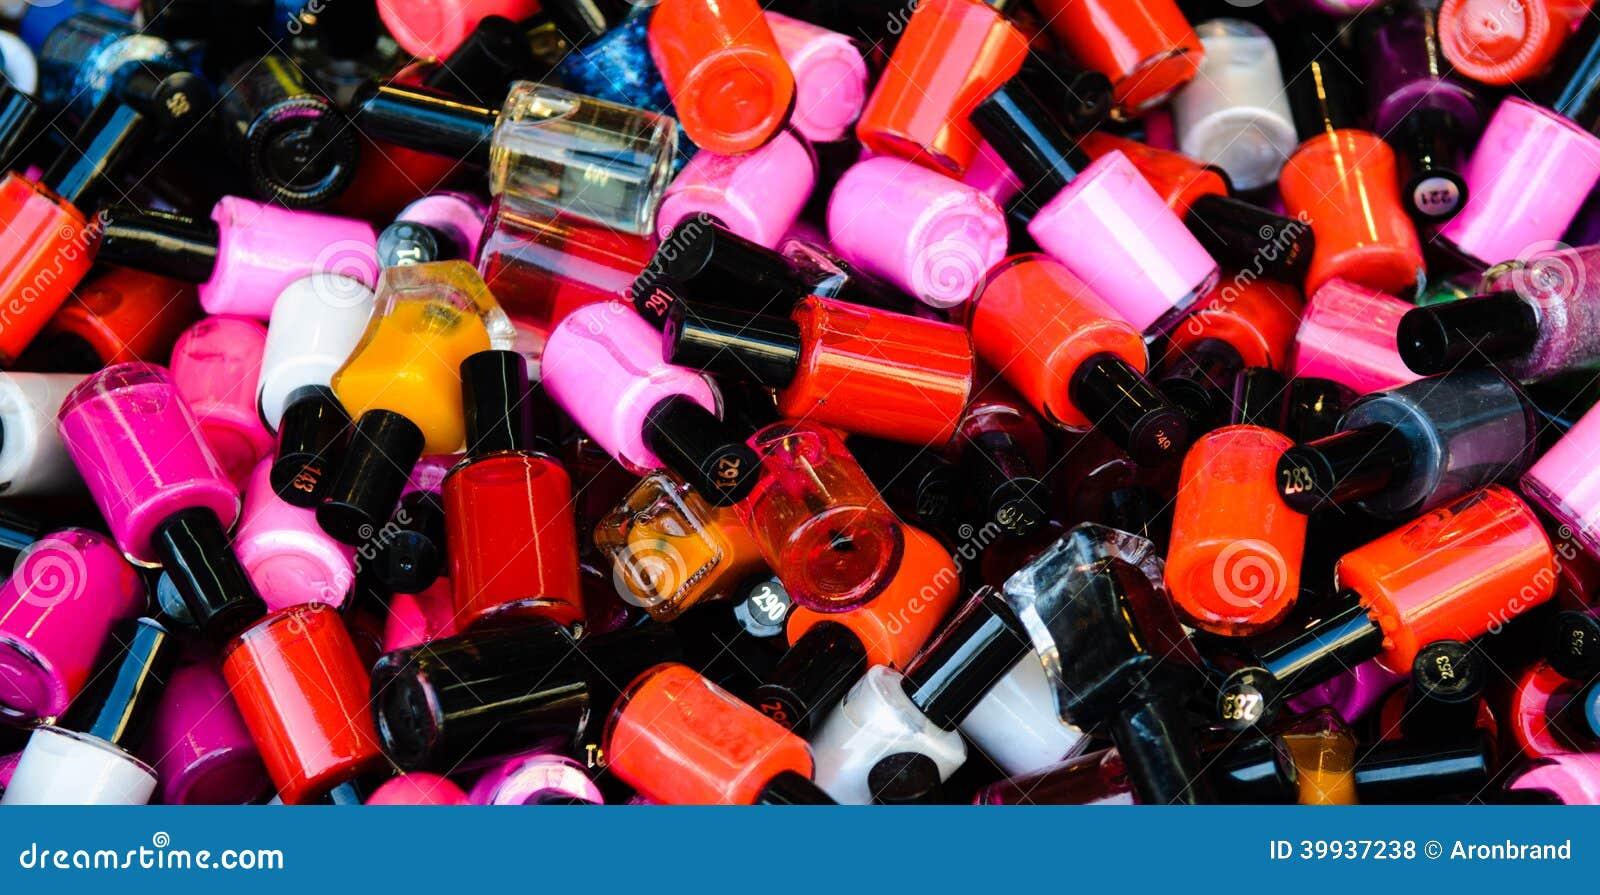 Nail polish stock photo. Image of inexpensive, closed - 39937238